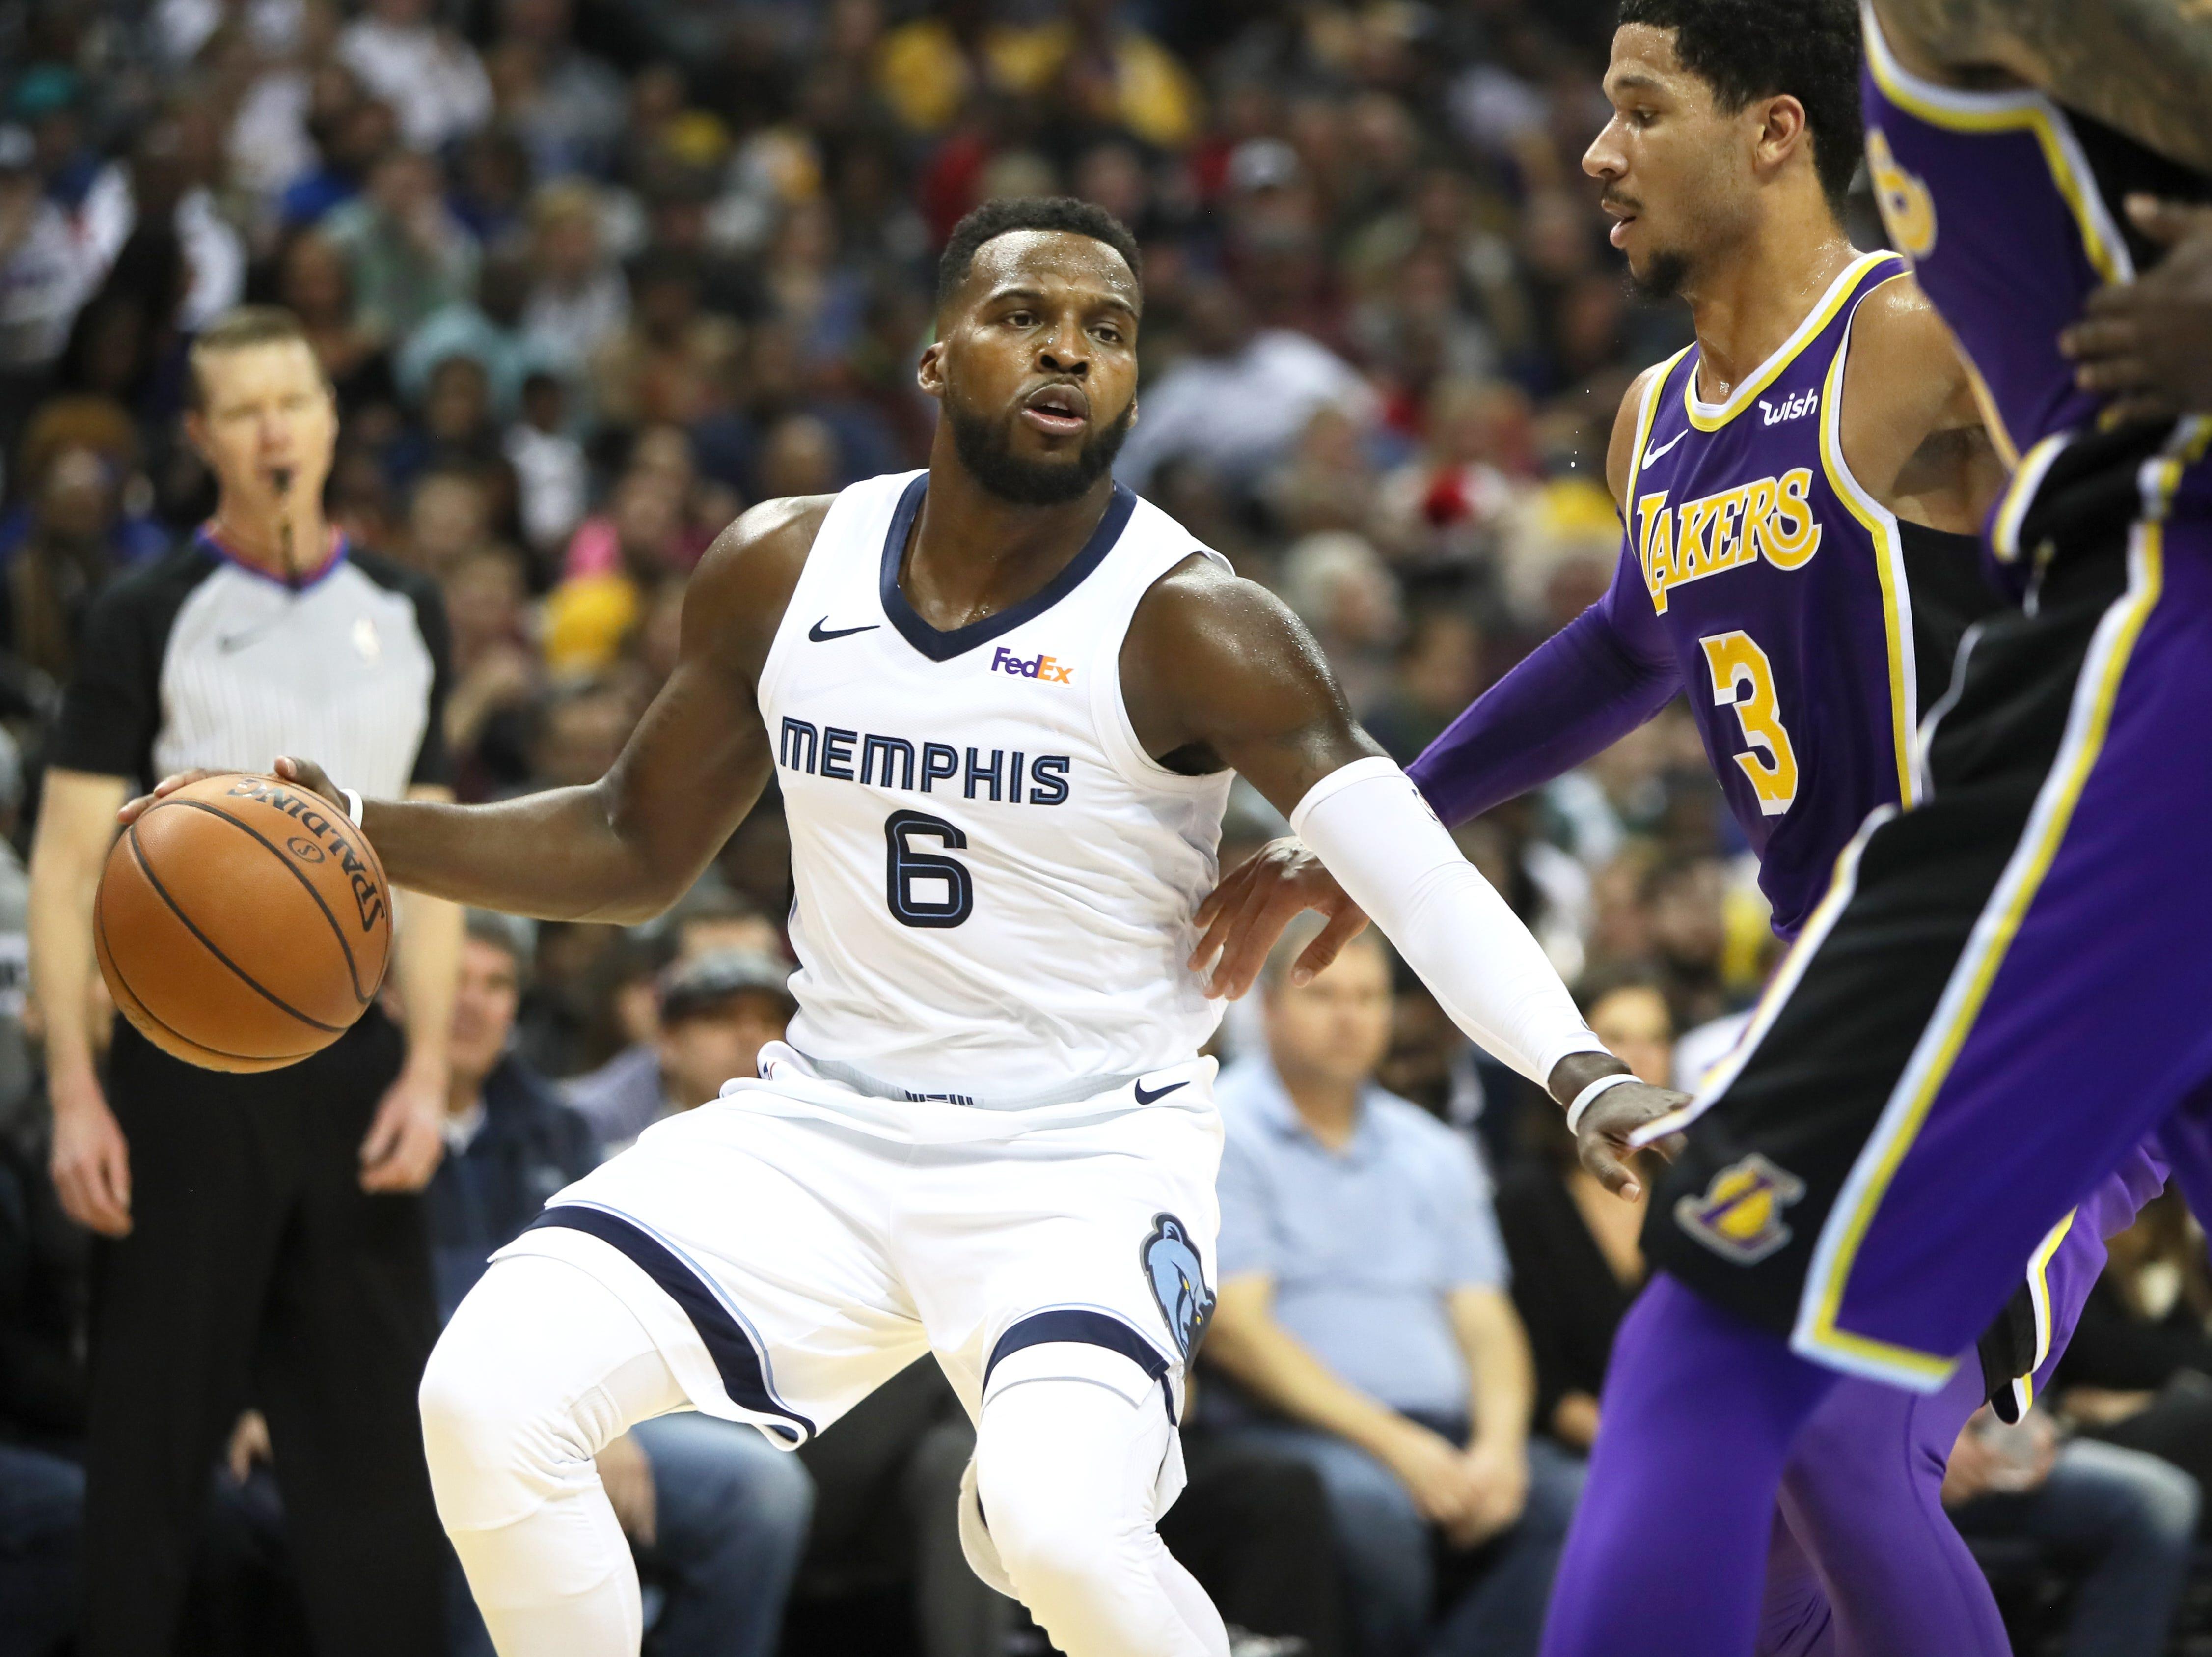 Memphis Grizzlies guard Shelvin Mack tries to get past  Los Angeles Lakers defender Josh Hart at the FedExForum on Saturday, Dec. 6, 2018.